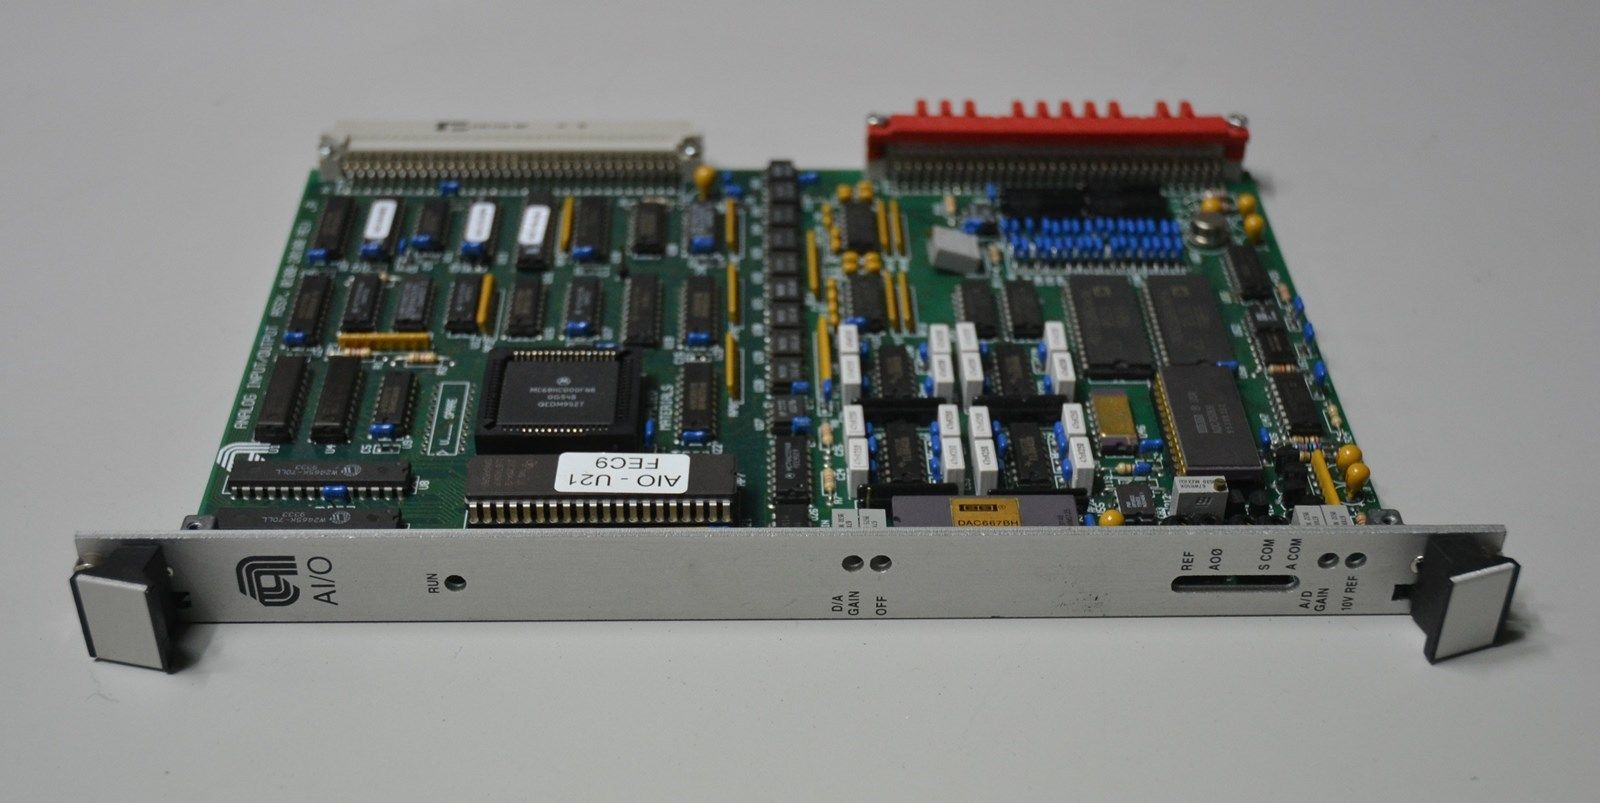 ANALOG I/O PCB 0100-20100